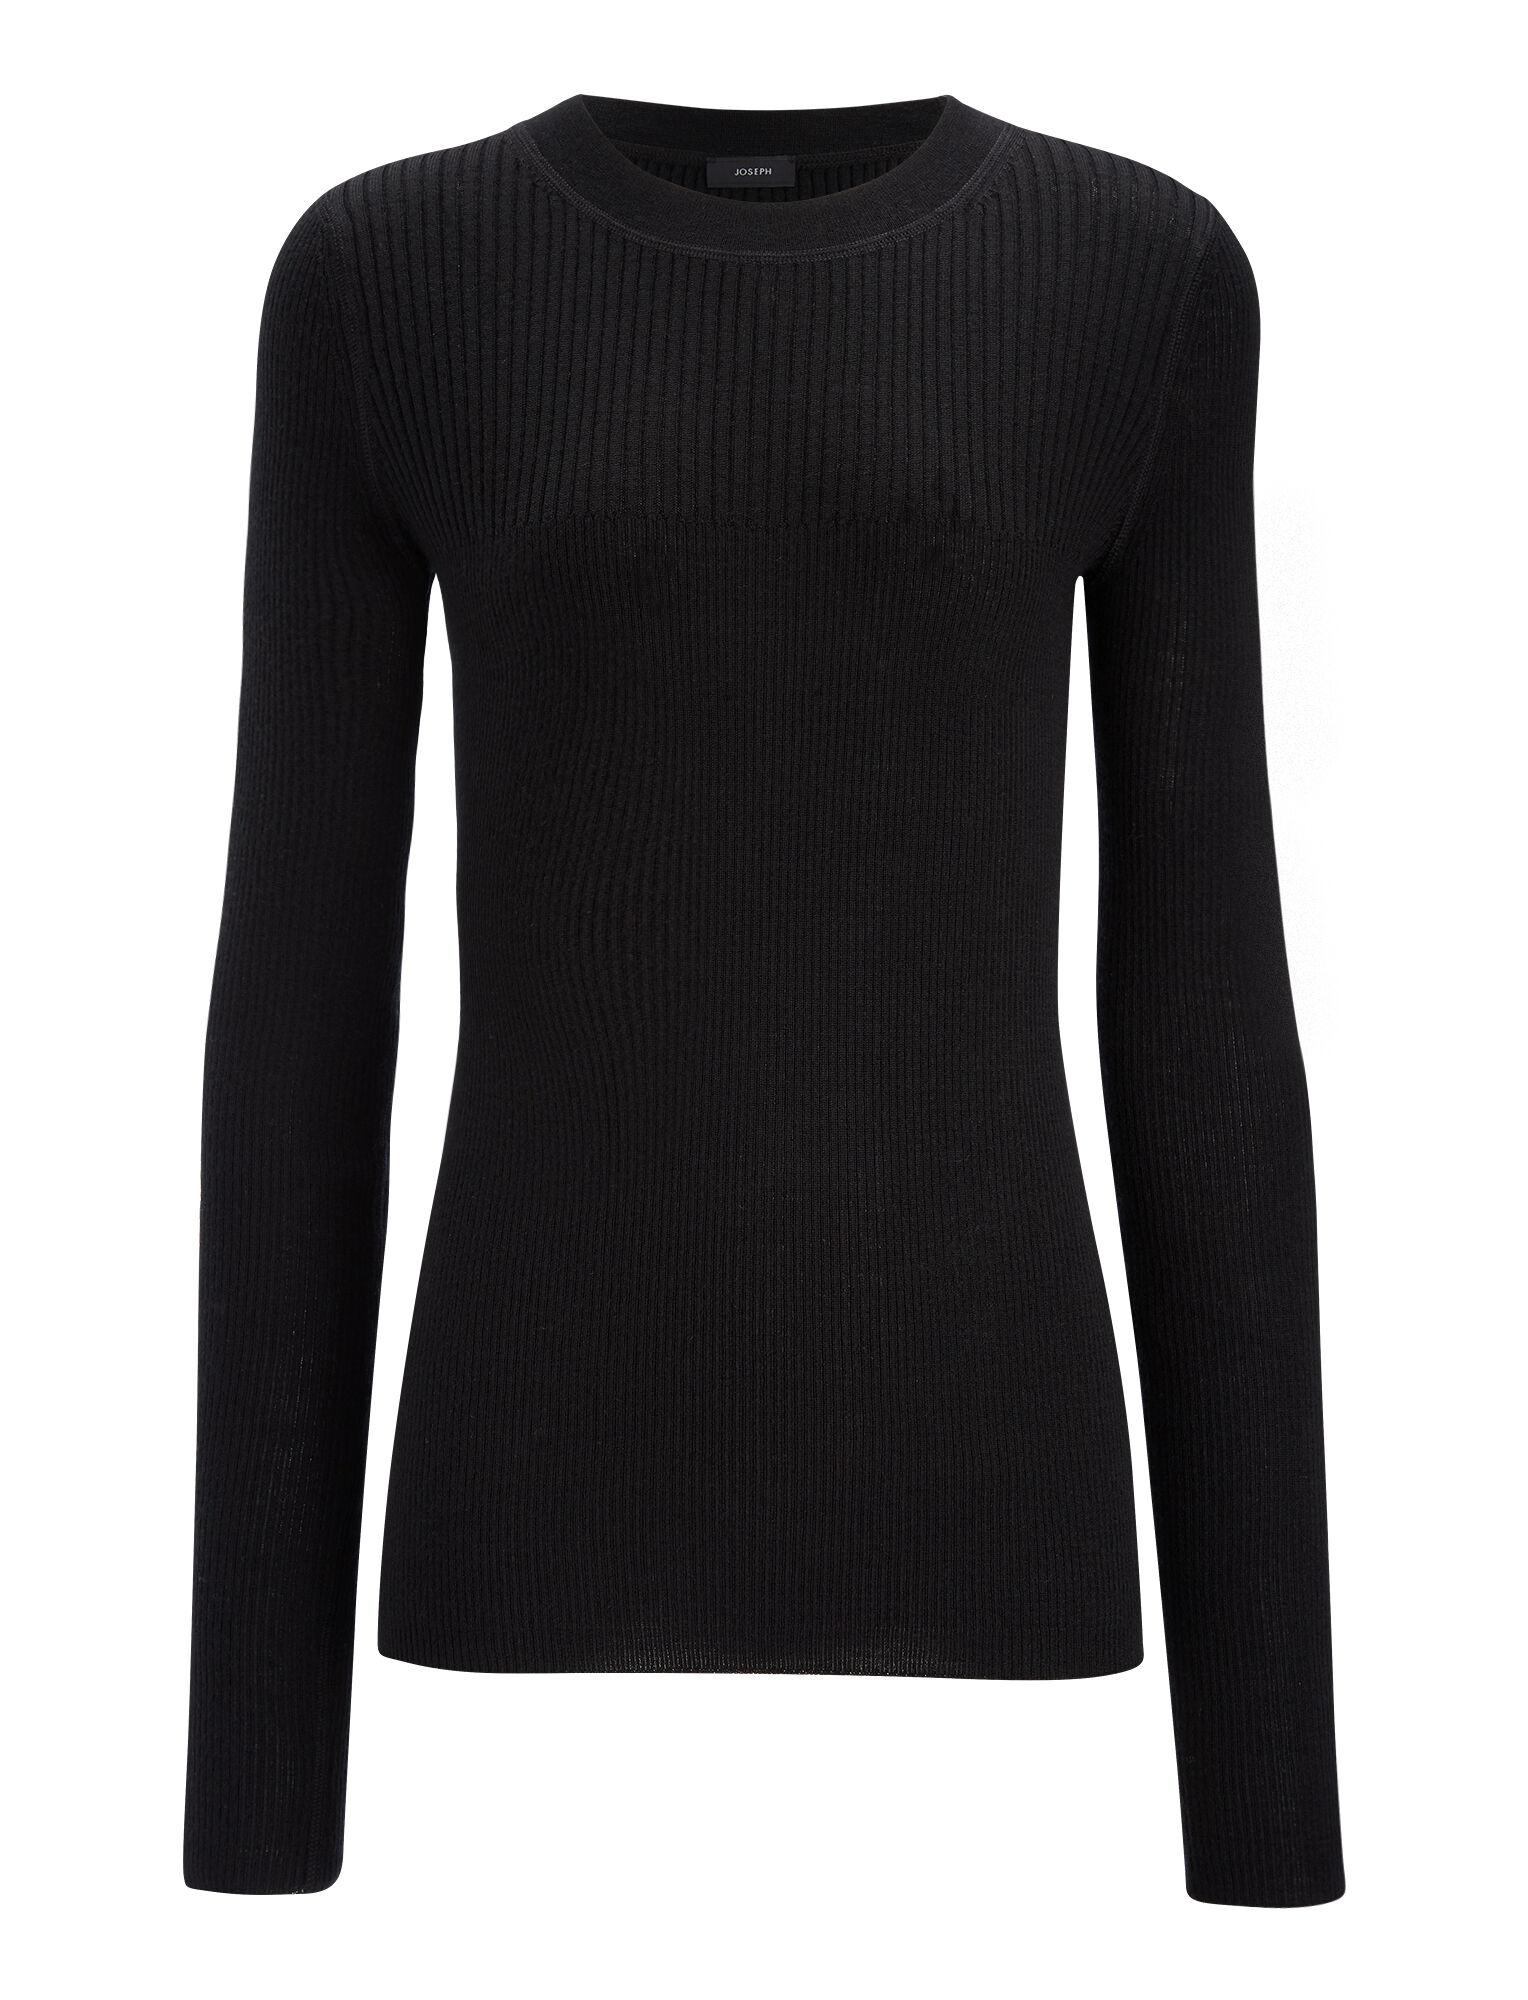 Joseph, Wool Silk Cashmere Rib Top, in BLACK ...